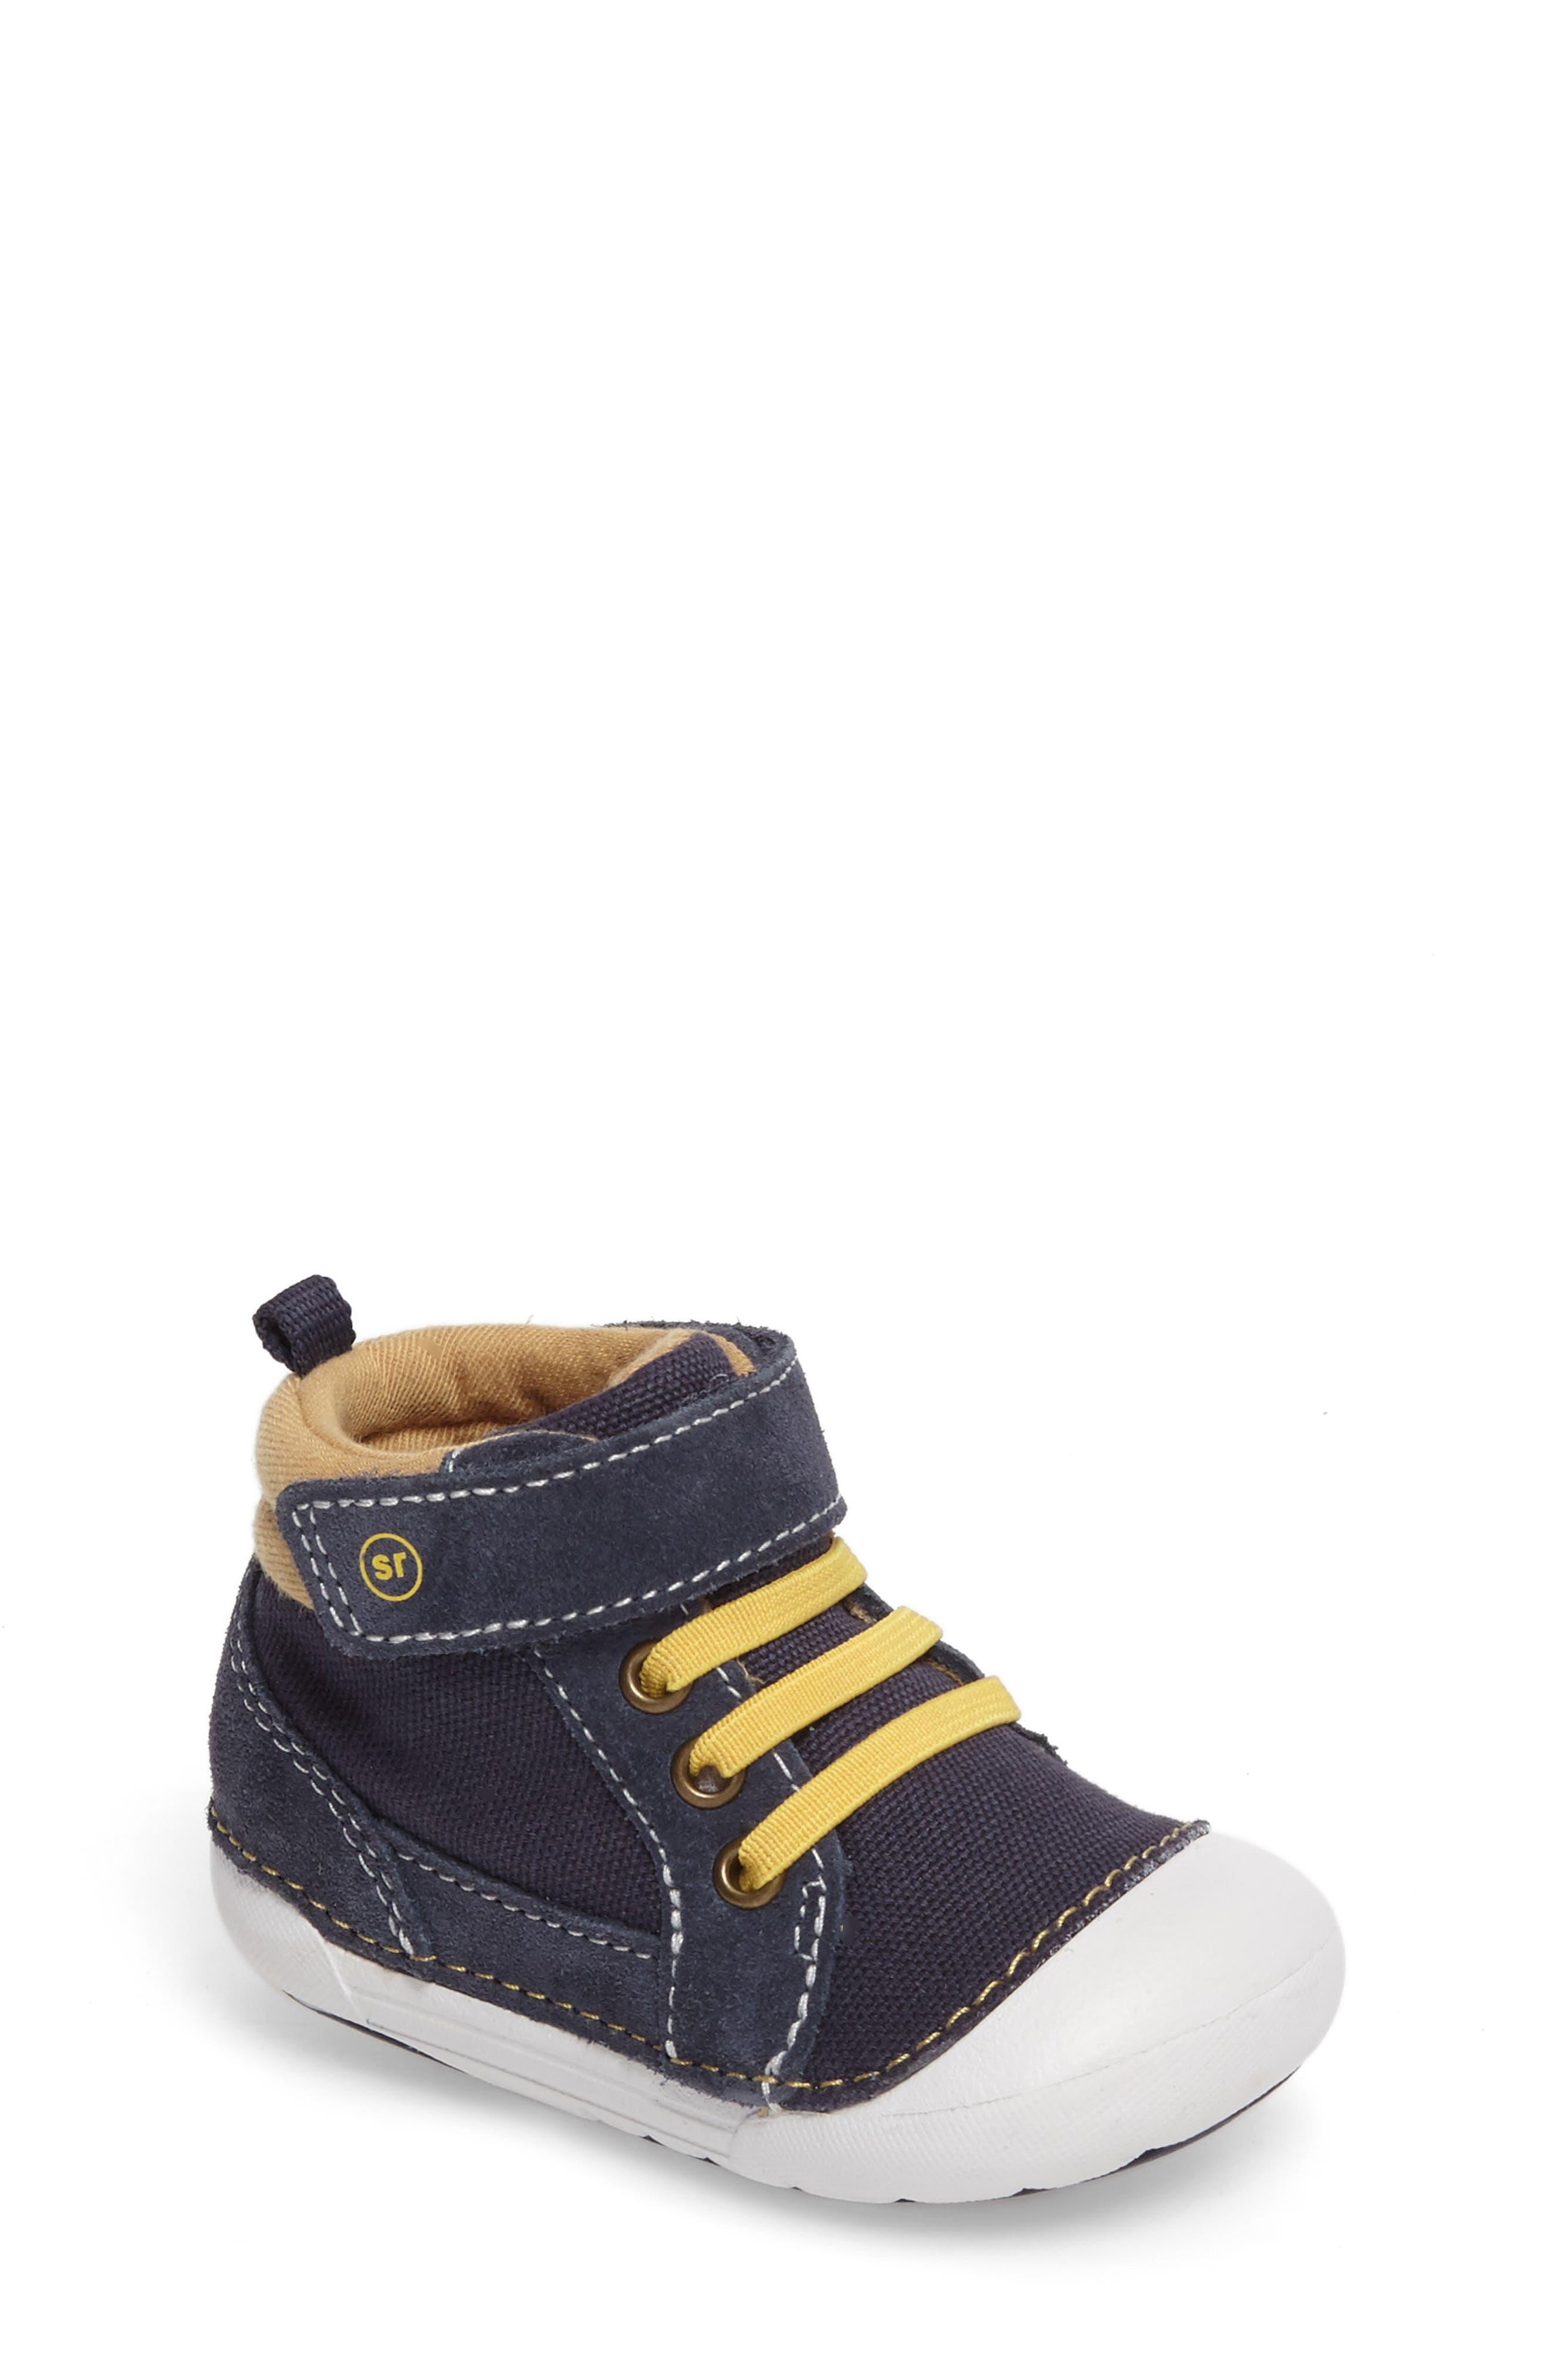 Soft Motion Danny Sneaker,                             Main thumbnail 1, color,                             410